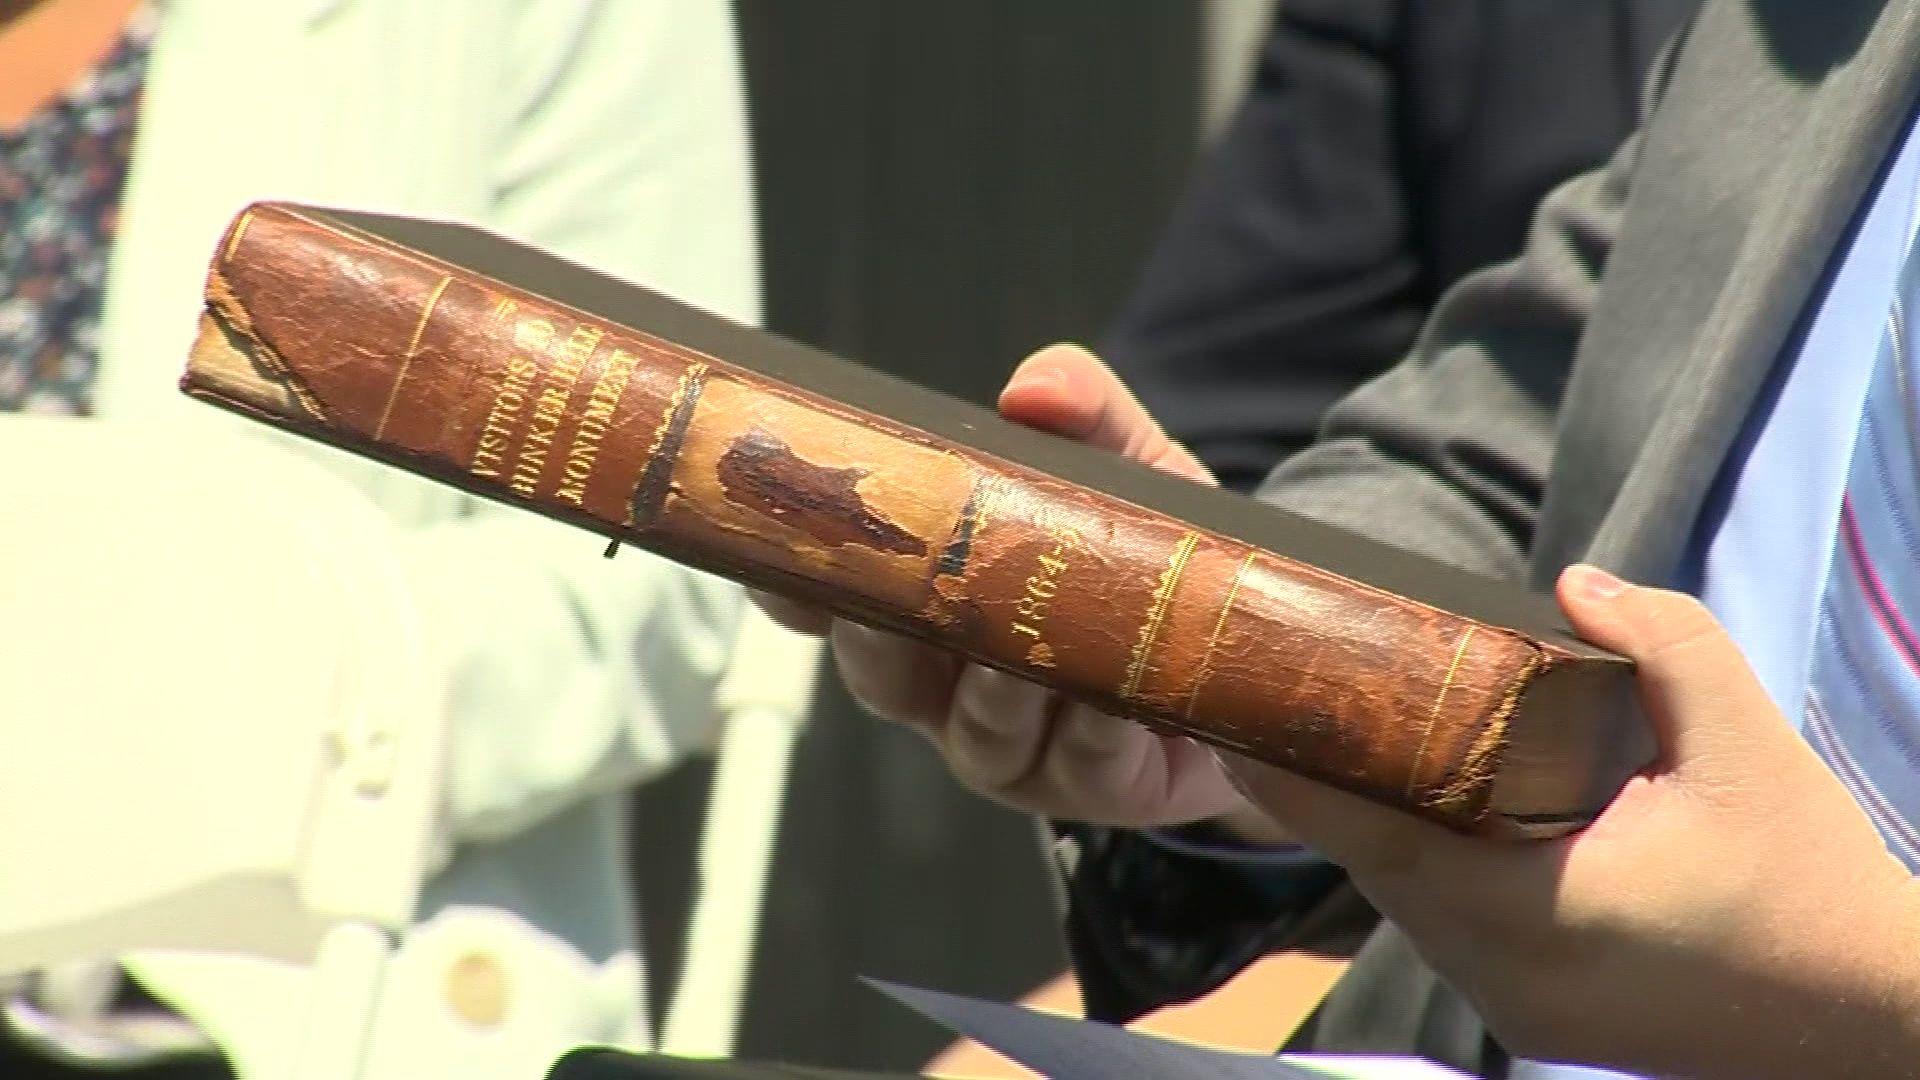 Philanthropist helps return treasured Civil War records to Charlestown monument